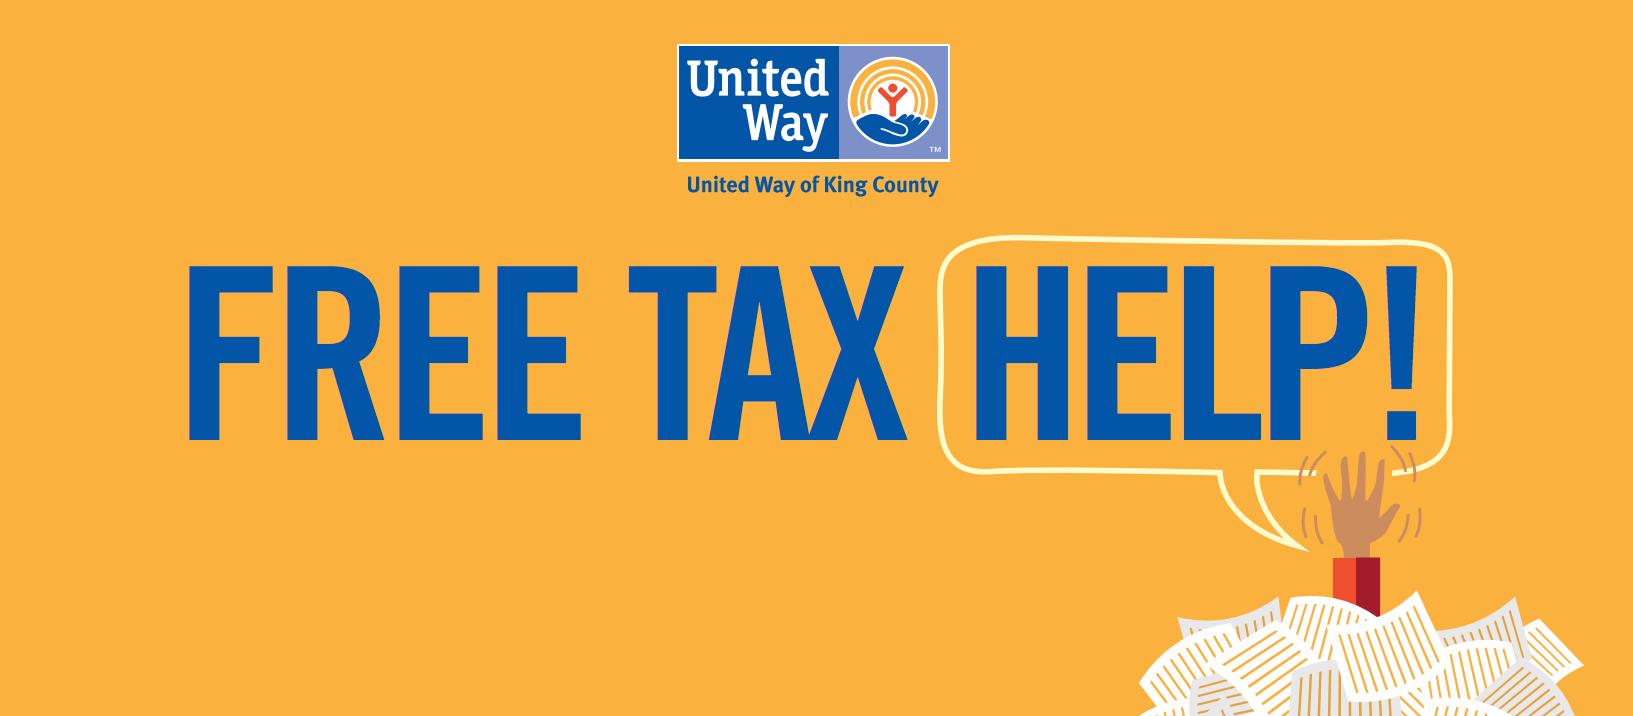 Free tax preparation available at the Tukwila Community Center - City of Tukwila